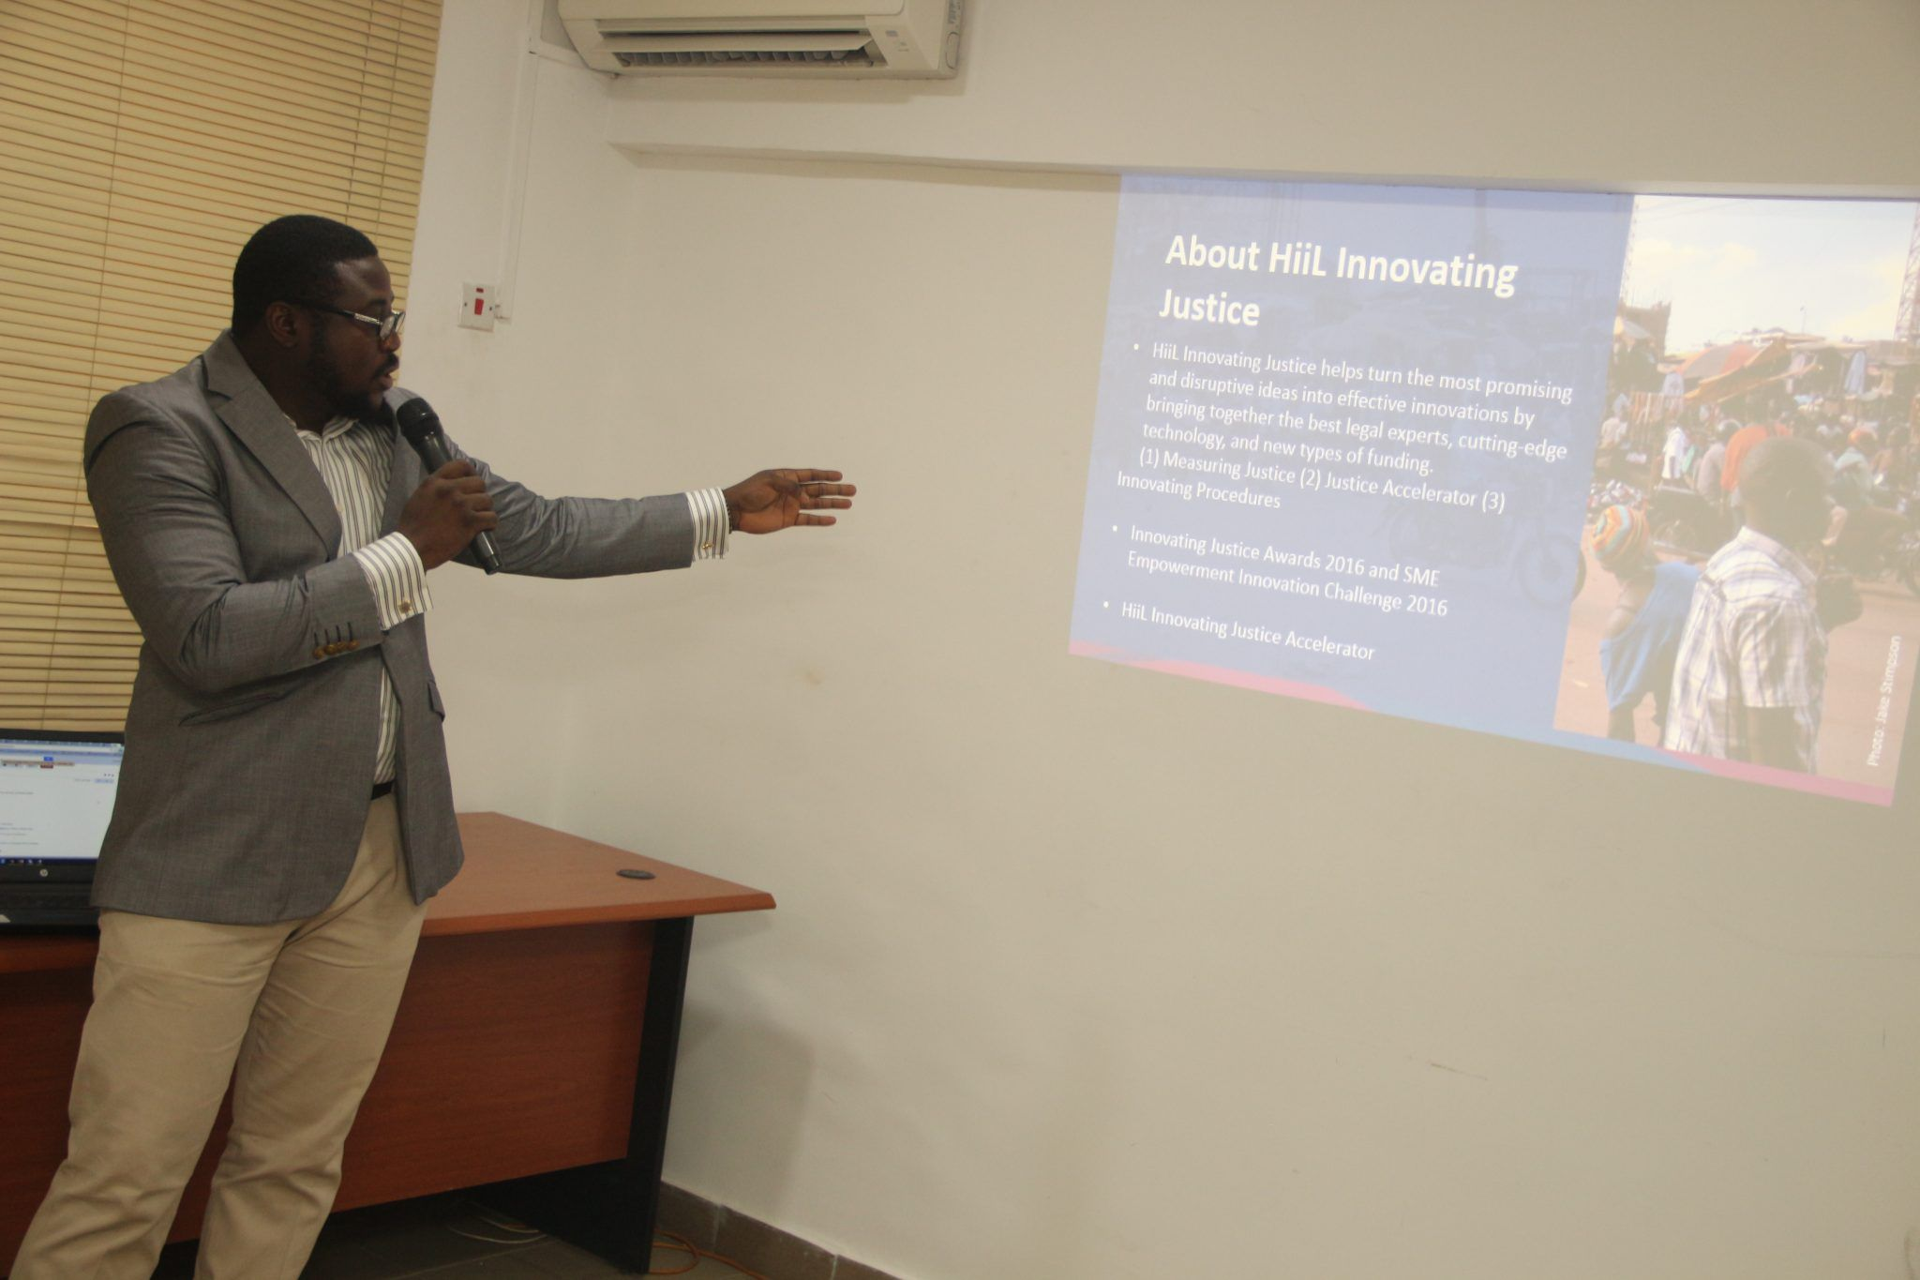 Hiil plans $40,000 Innovation Challenge for Nigerian Start-ups